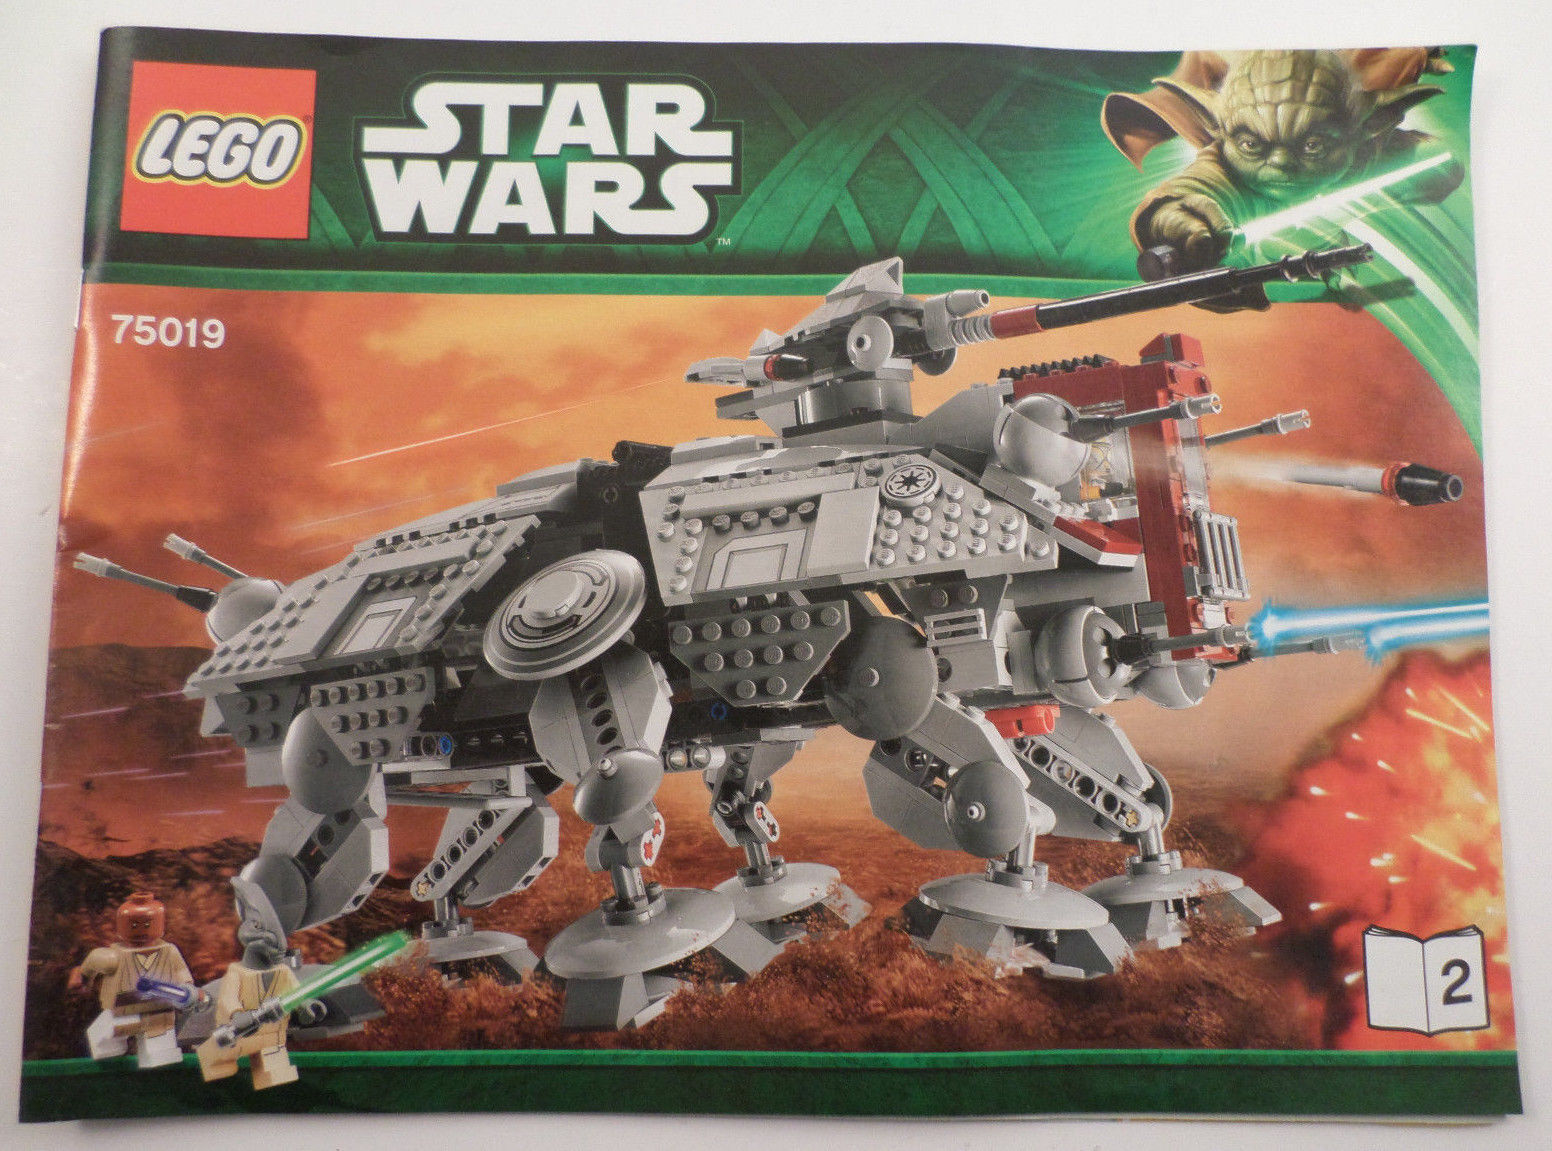 Lego Star Wars 2 Instruction Manuals T Score Table For Ecbi